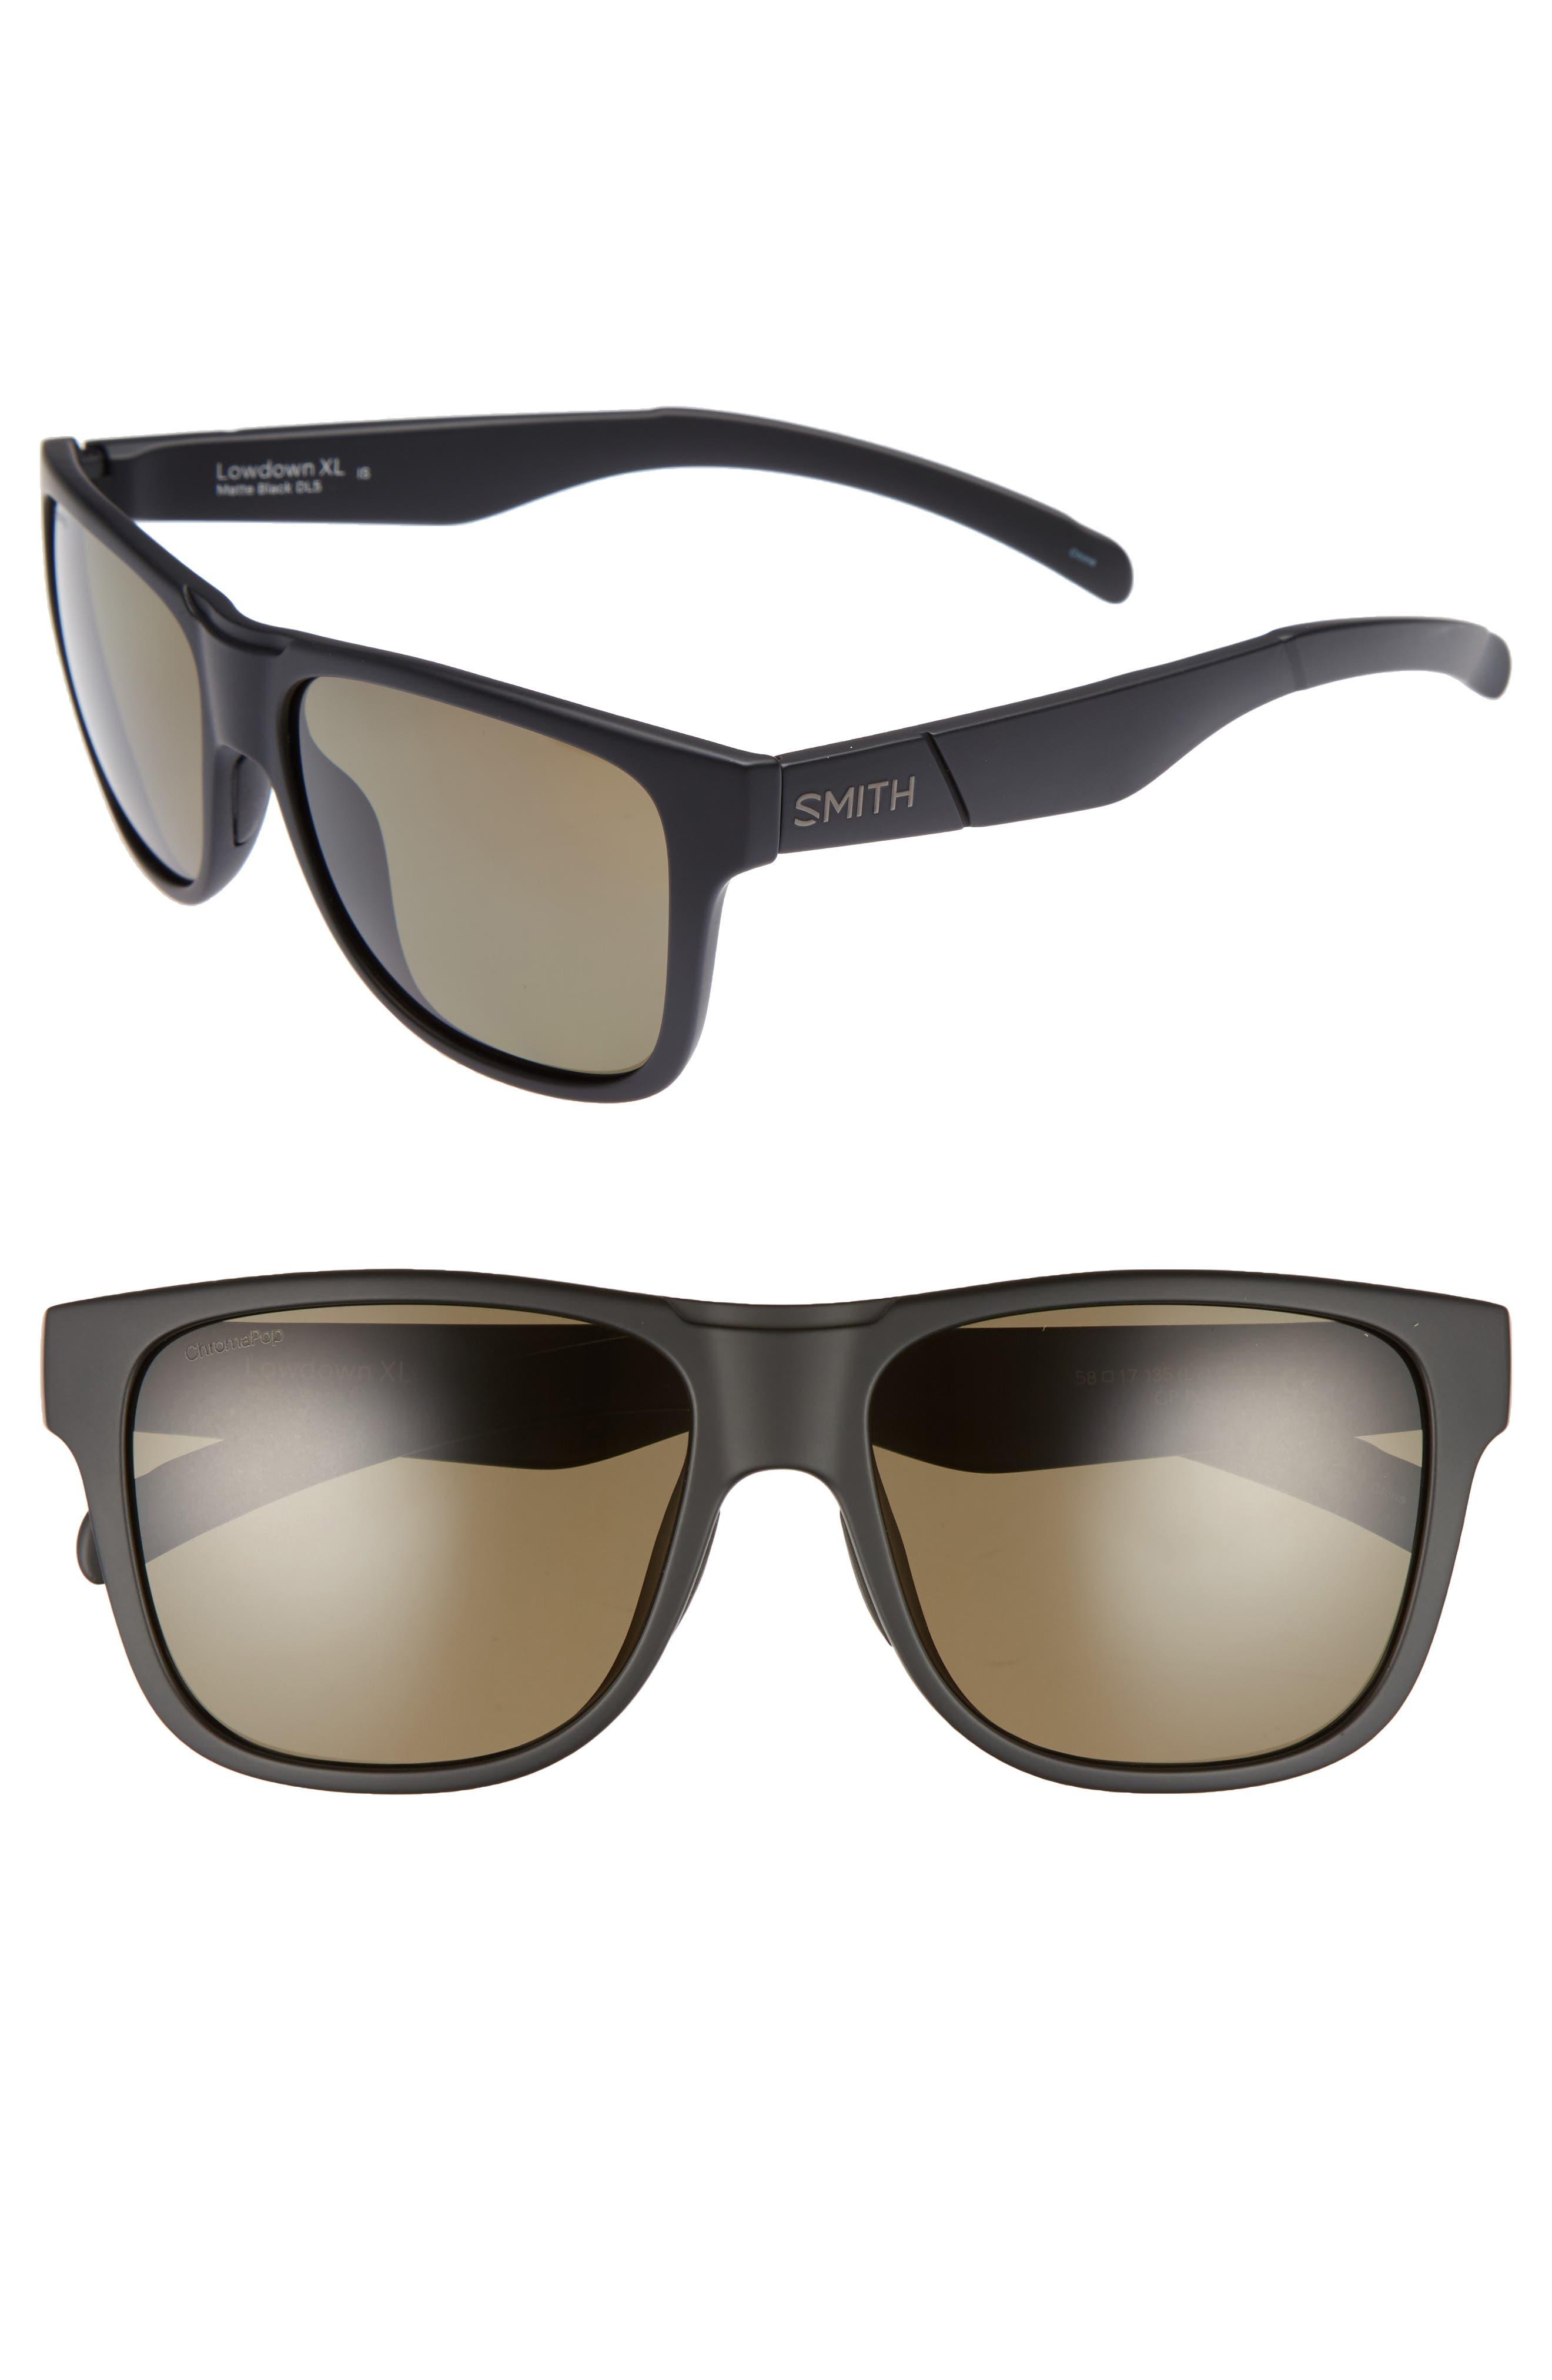 Alternate Image 1 Selected - Smith Lowdown XL 58mm Polarized Sunglasses